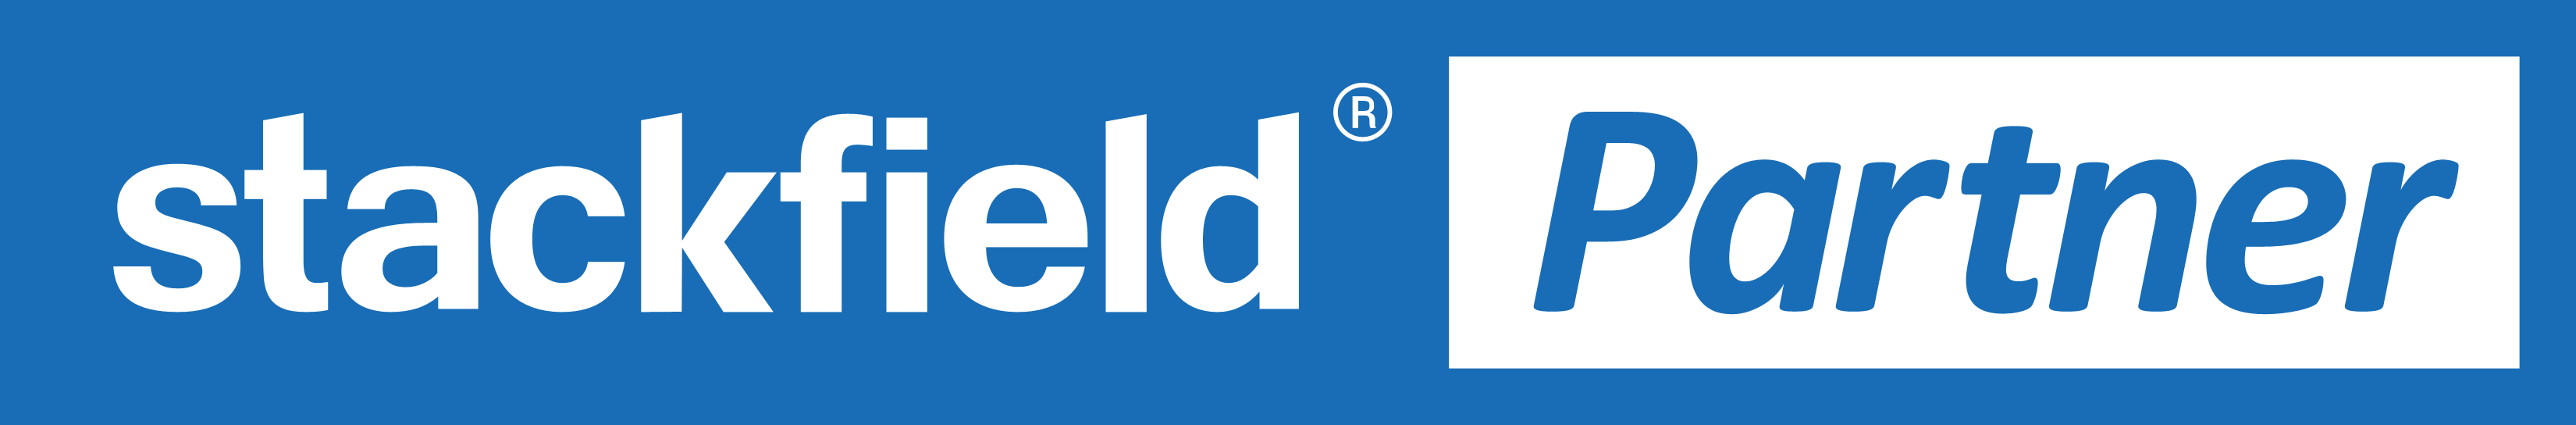 Stackfield Partner